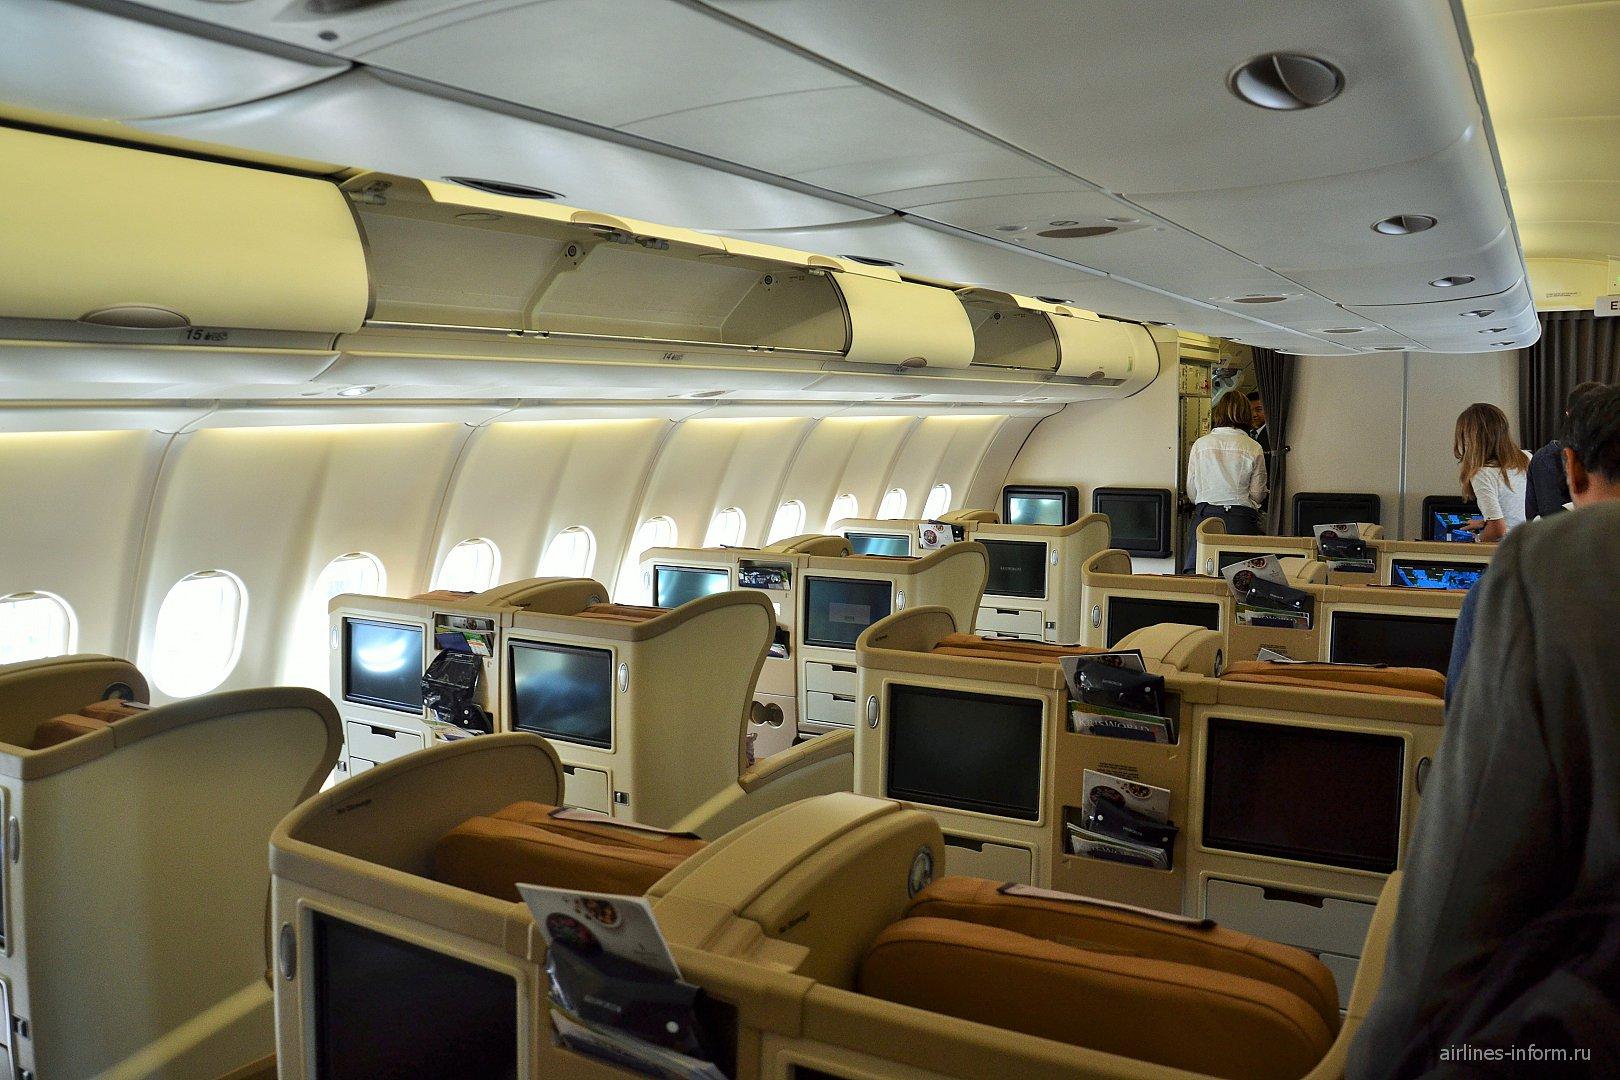 Салон бизнес-класса самолета Airbus A330-300 Синг